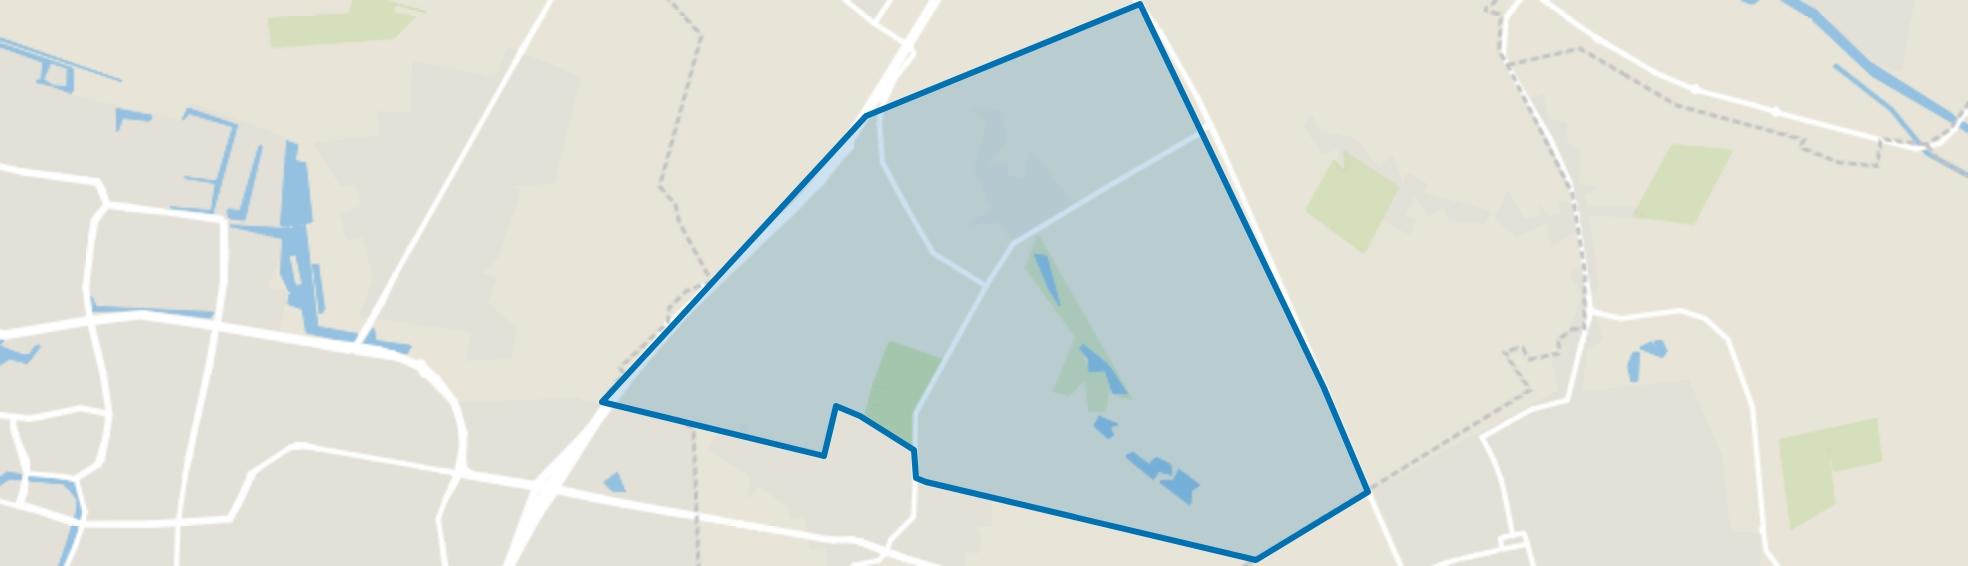 Bosgebied Dorst, Dorst map